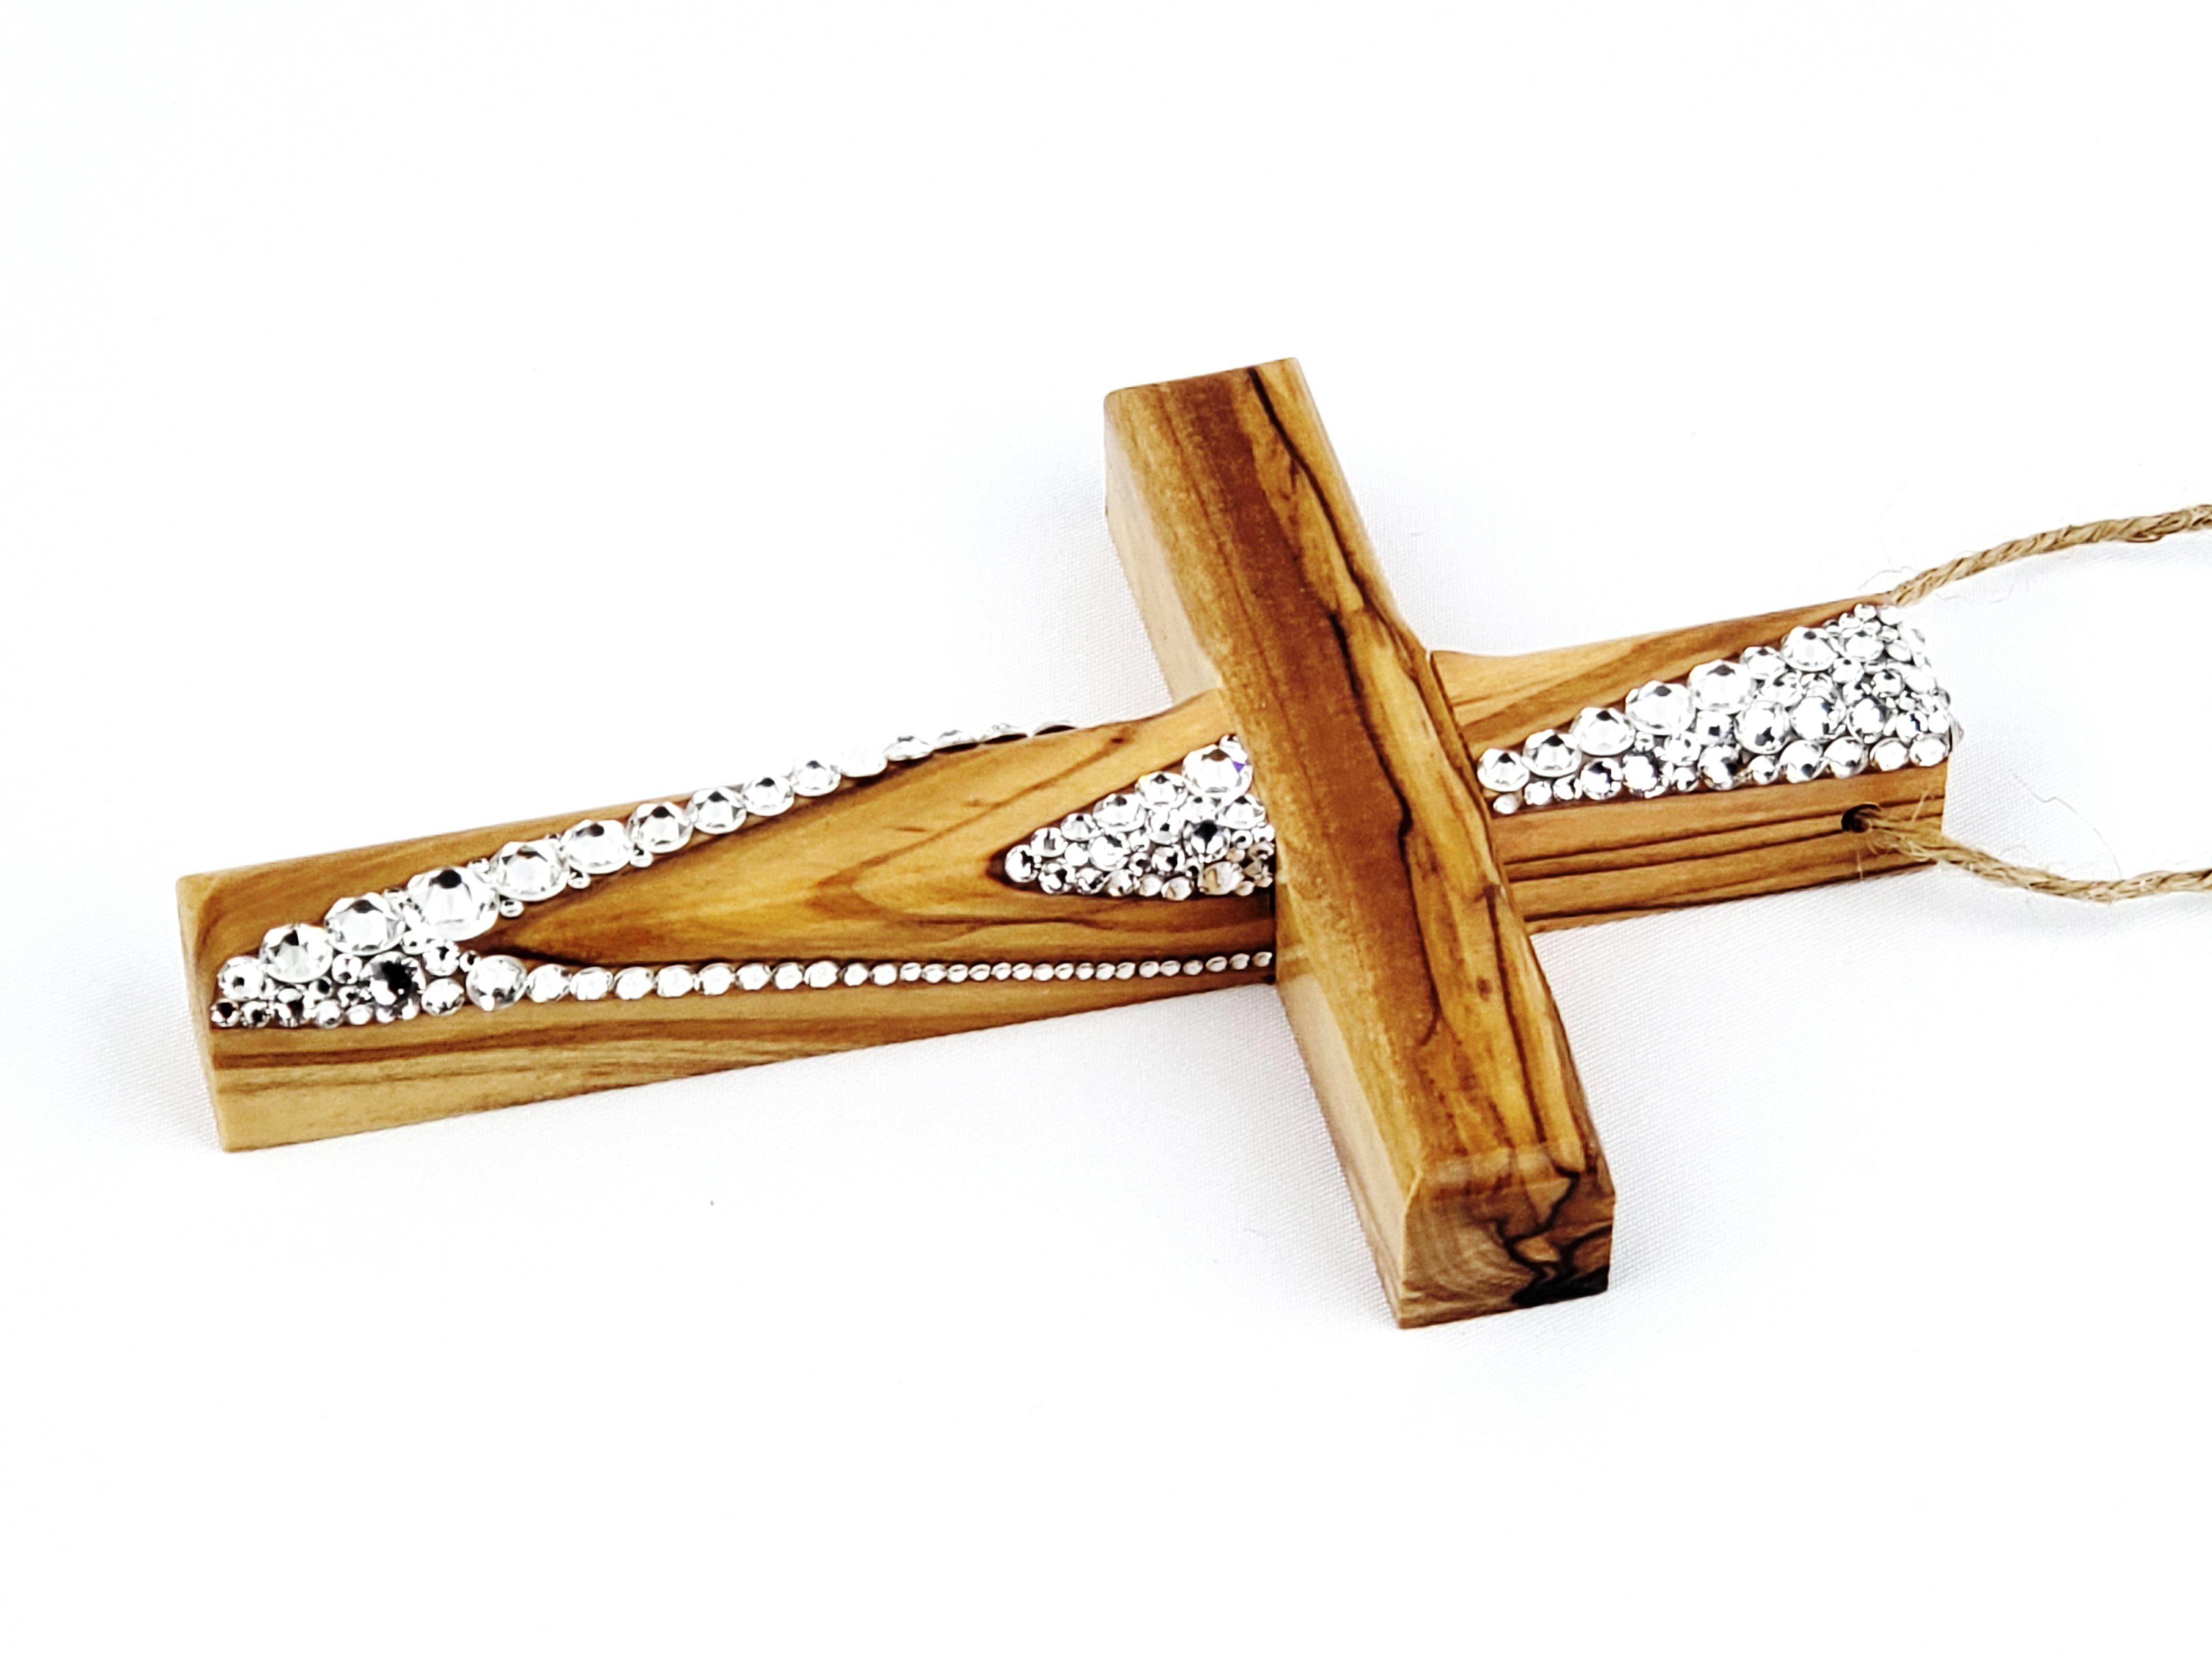 Candy Striped Olive Wood Cross Ornament Rustic Elegance